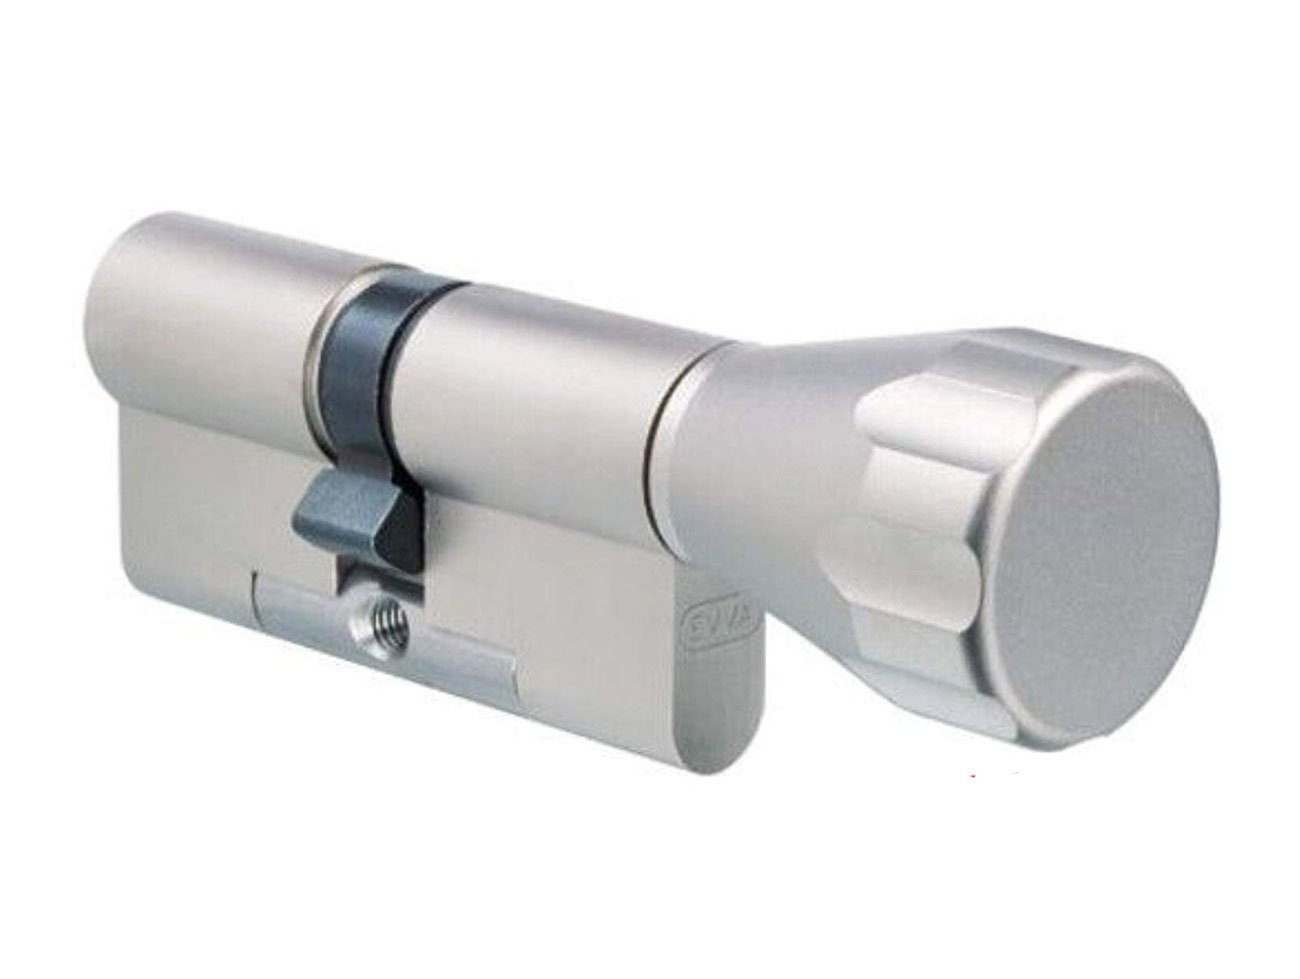 Cilindro-4KS-Evva-1 Serrature Porte Blindate